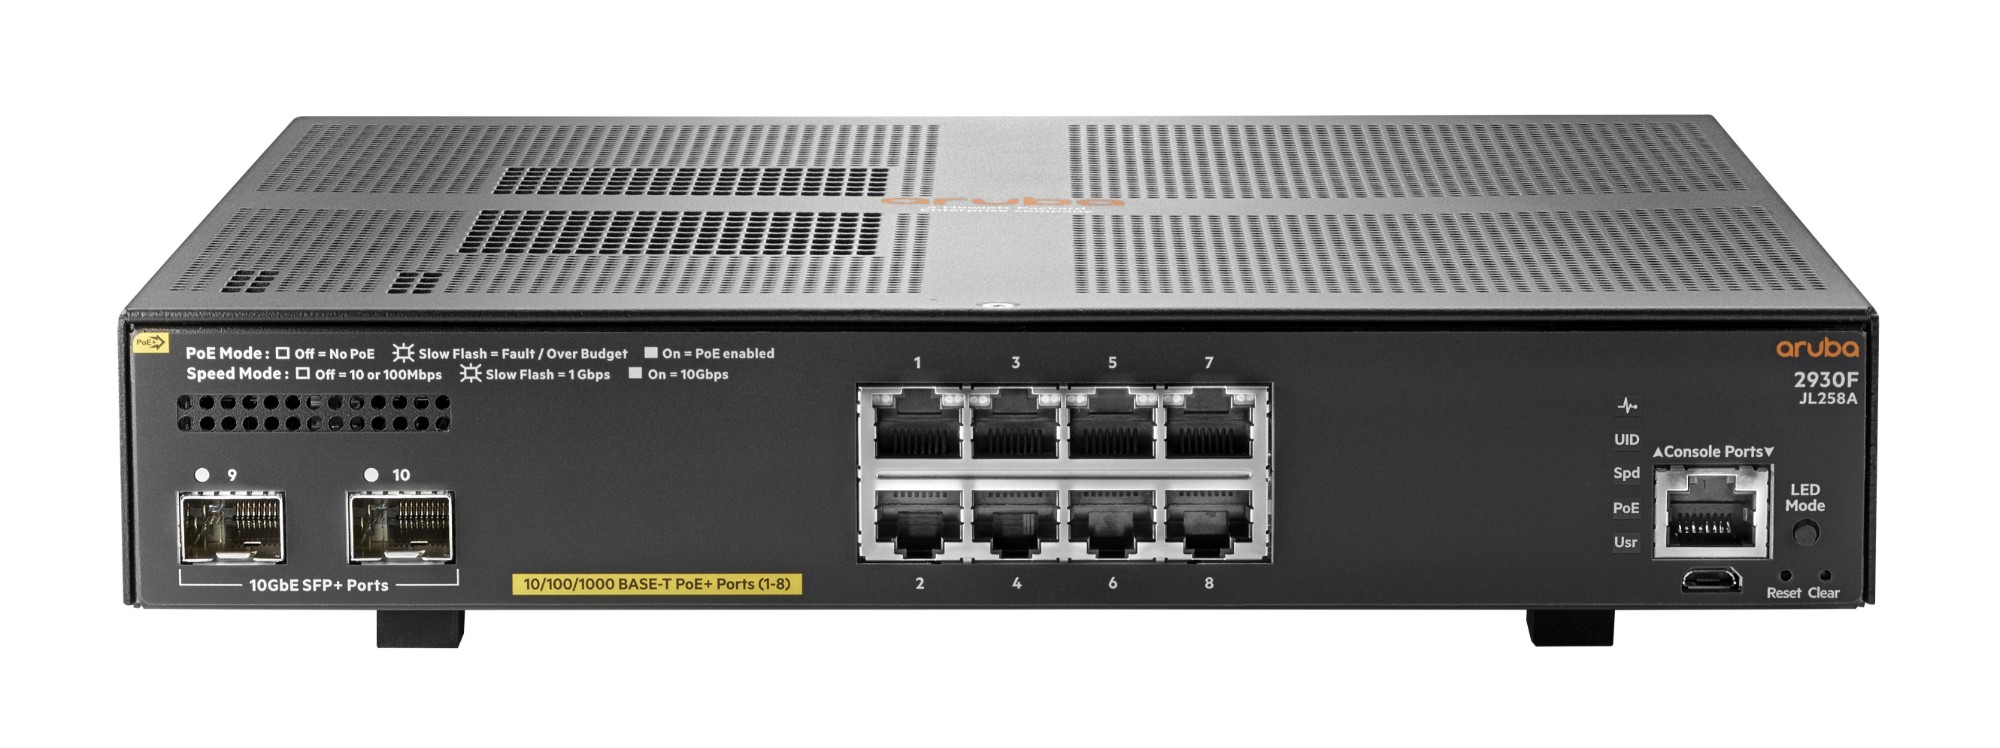 Hewlett Packard Enterprise Aruba 2930F 8G PoE+ 2SFP+ Gestionado L3 Gigabit Ethernet (10/100/1000) Gris 1U Energía sobre Ethernet (PoE)